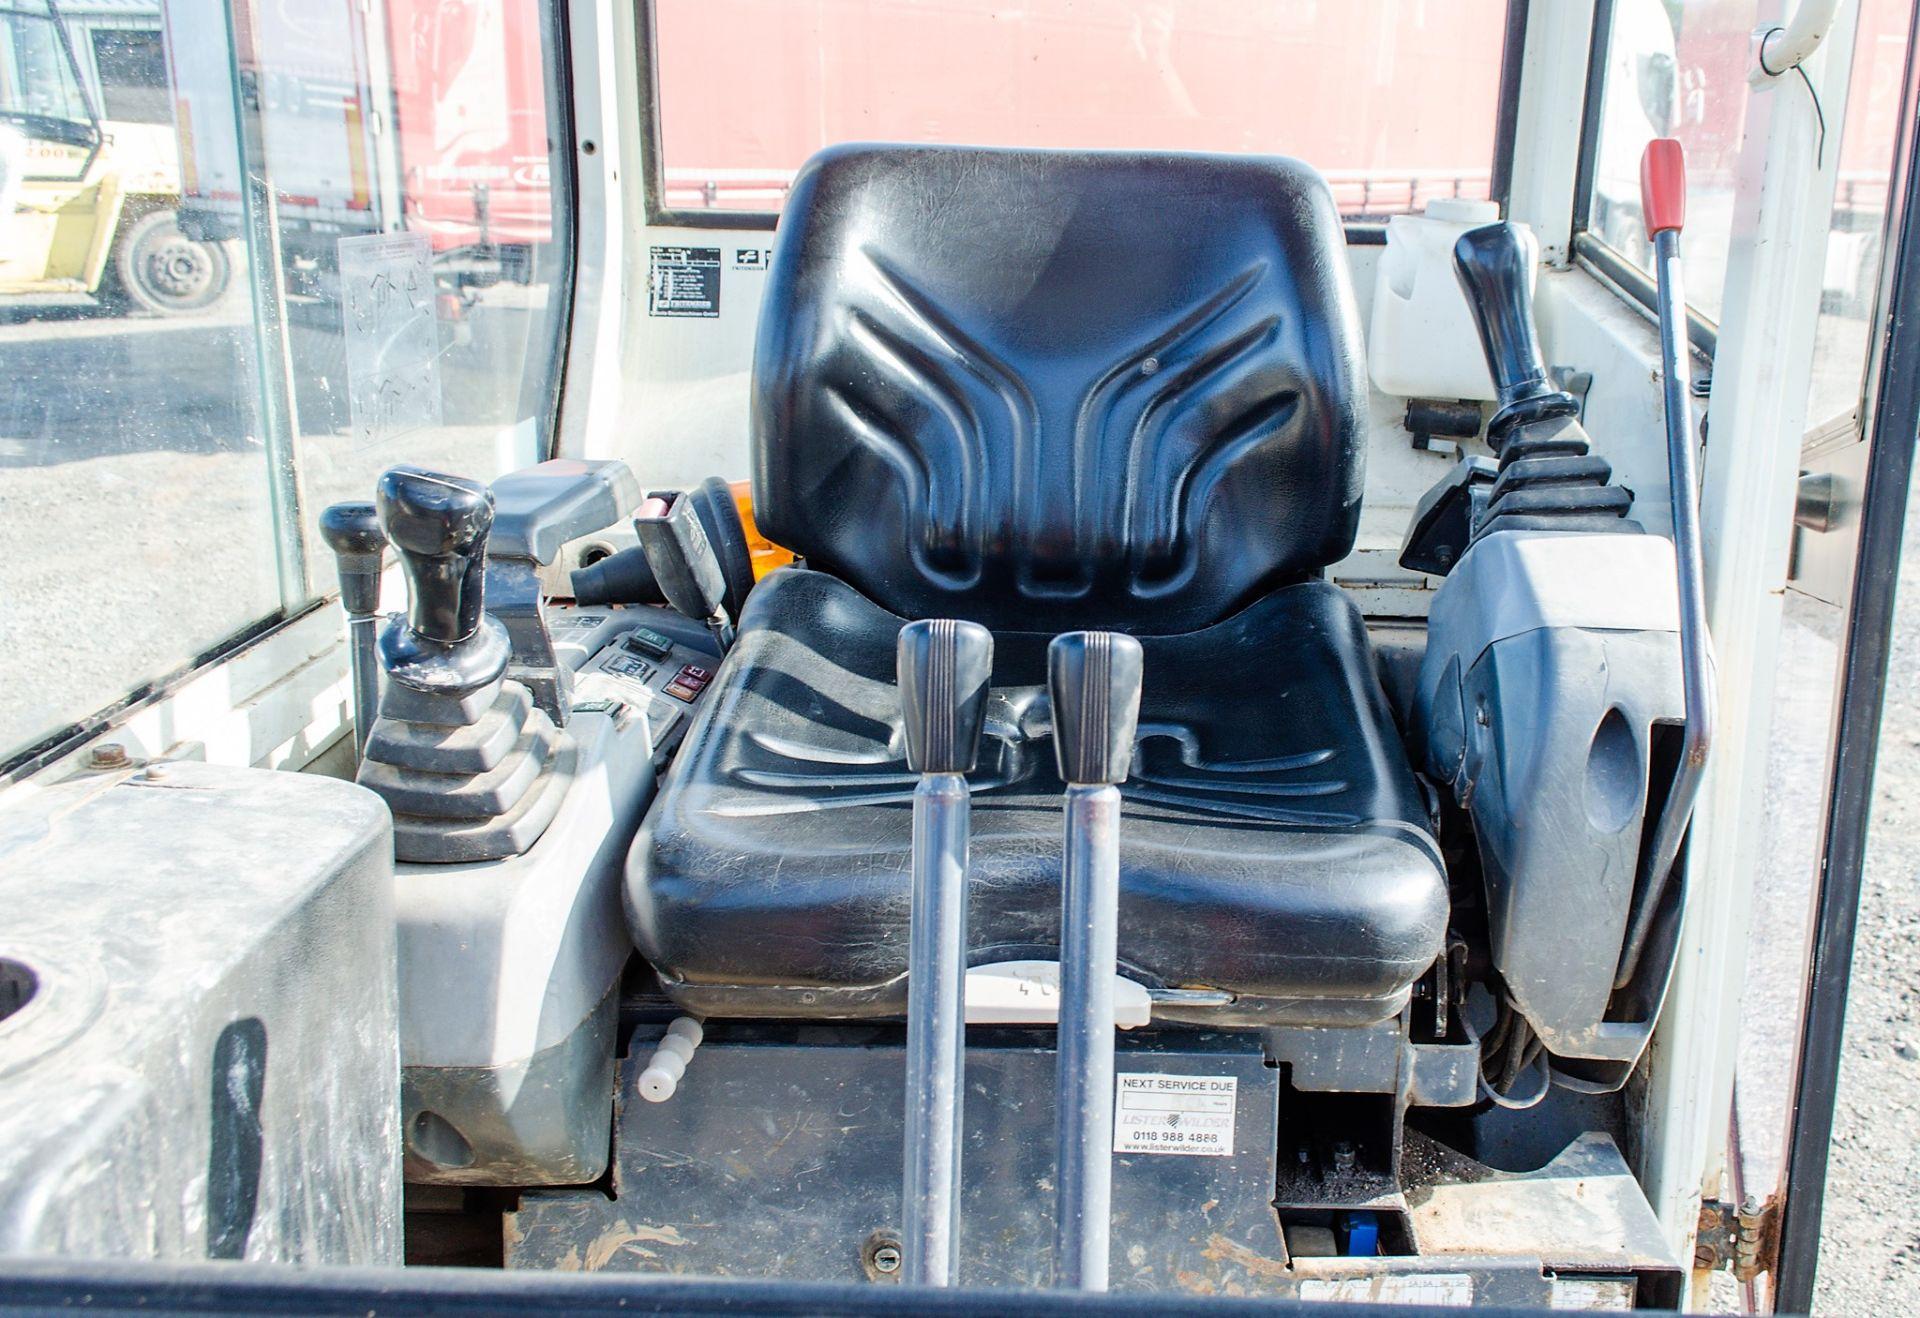 Kubota KX36-3 1.5 tonne rubber tracked mini excavator Year: 2007 S/N: Z077298 Recorded Hours: 4205 - Image 17 of 18